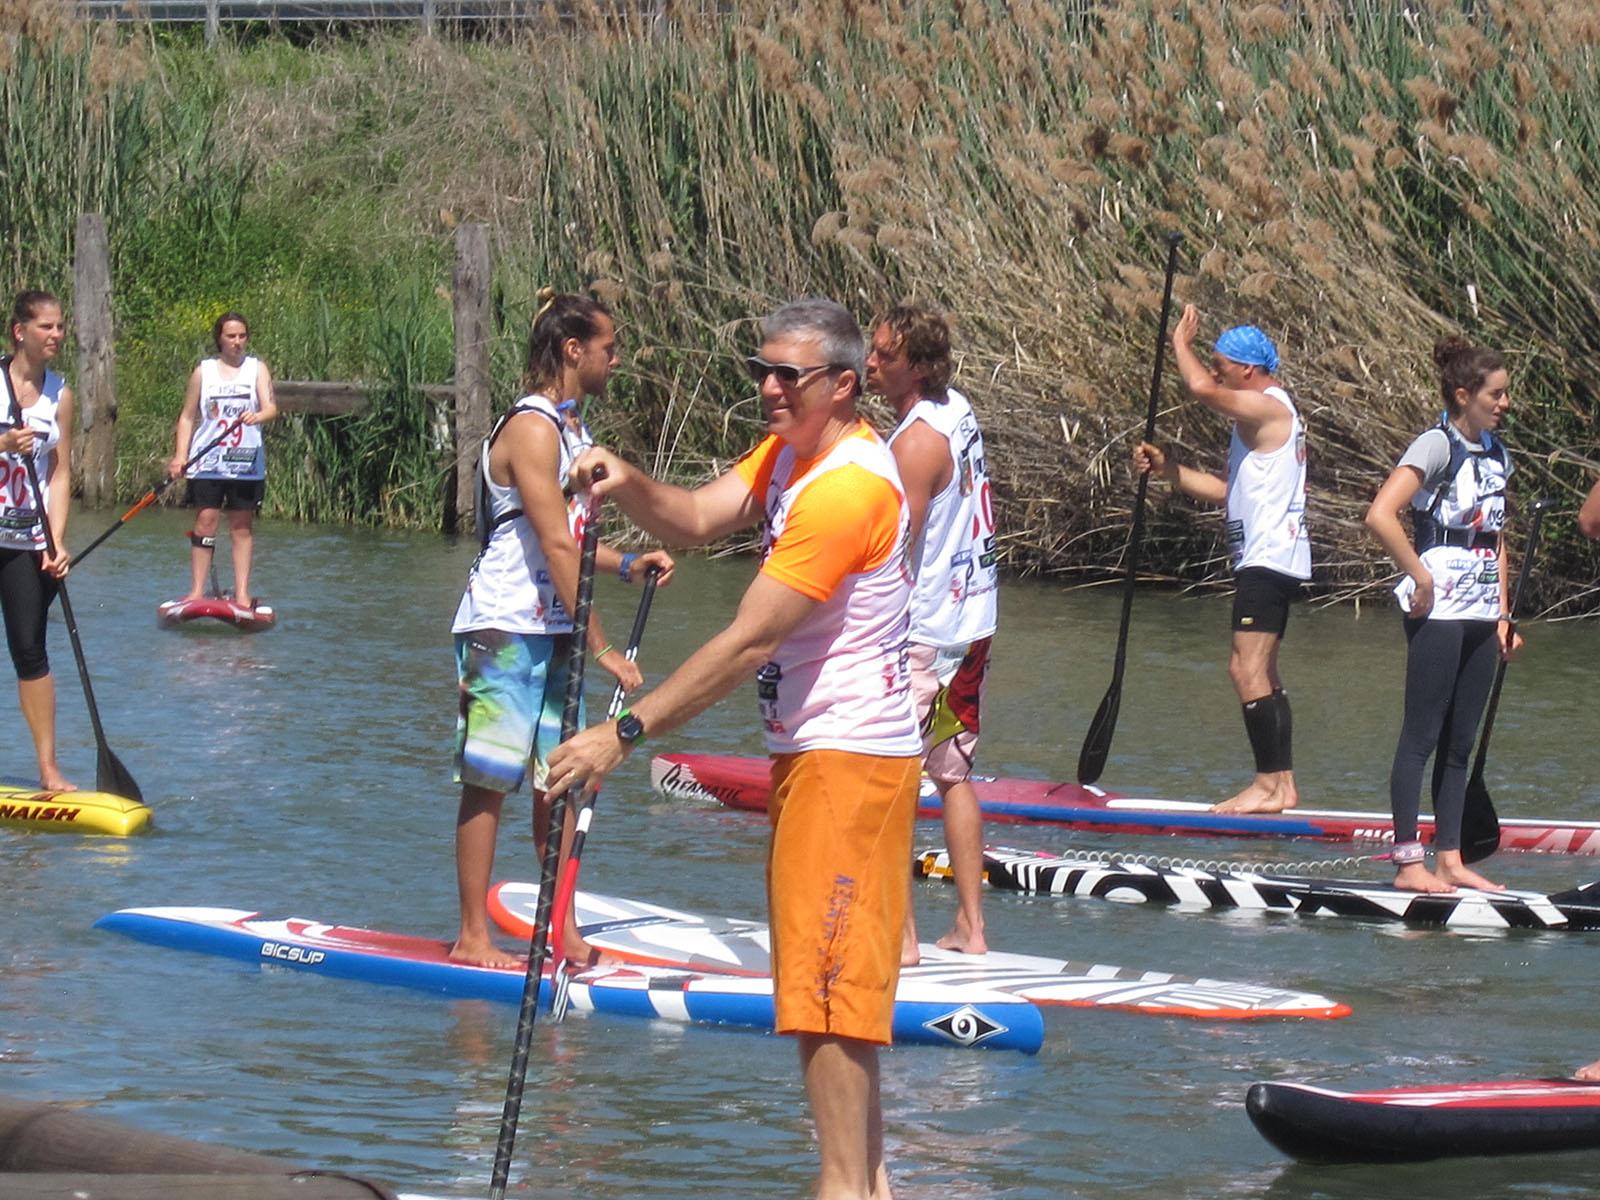 sup-news-2017-fluvial-race-padova-11